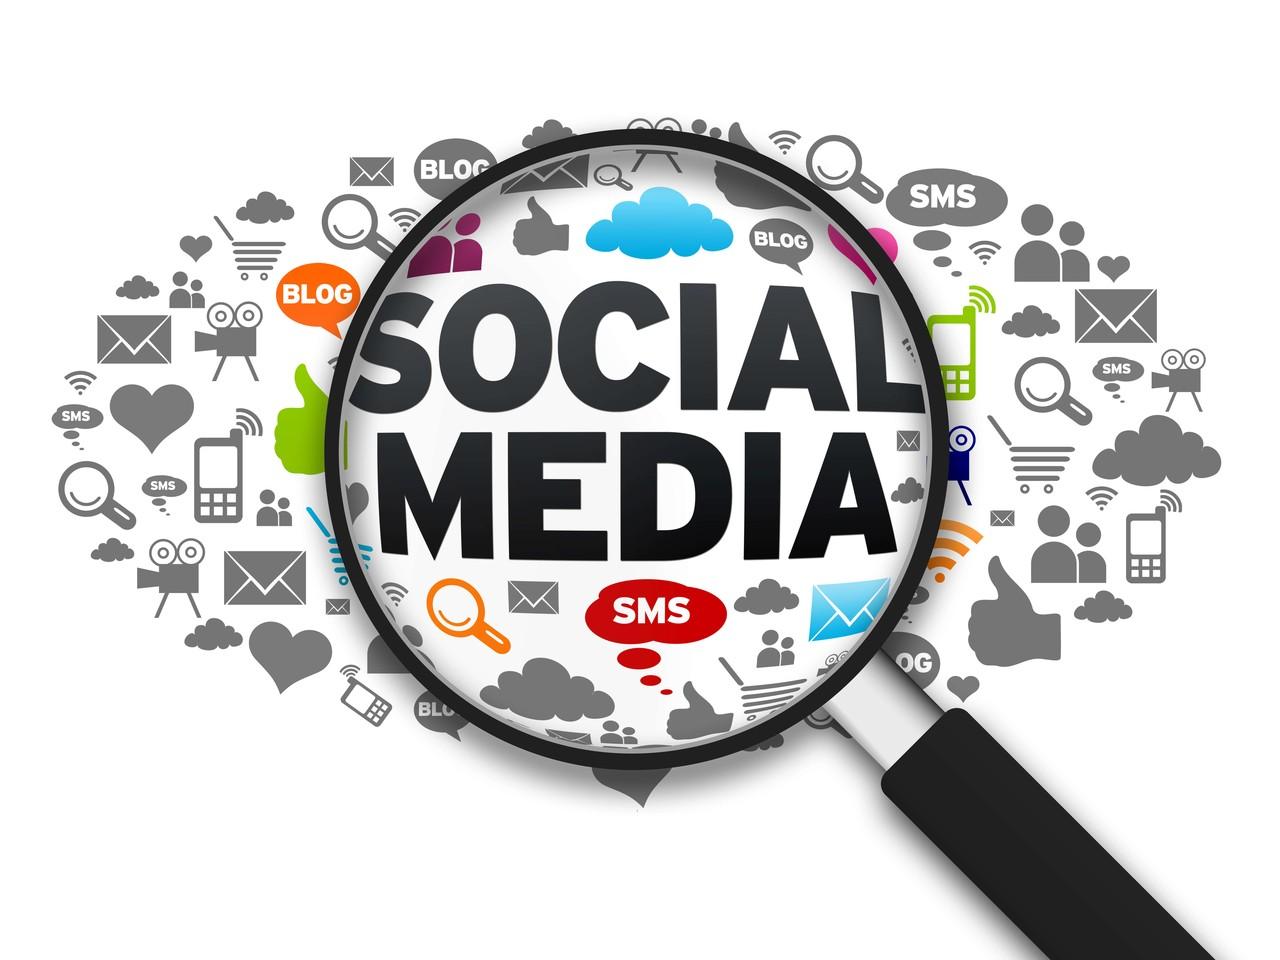 Wie zitiert man aus Blogs, Facebook, Twitter & Co.? - Schreibwerkstatt